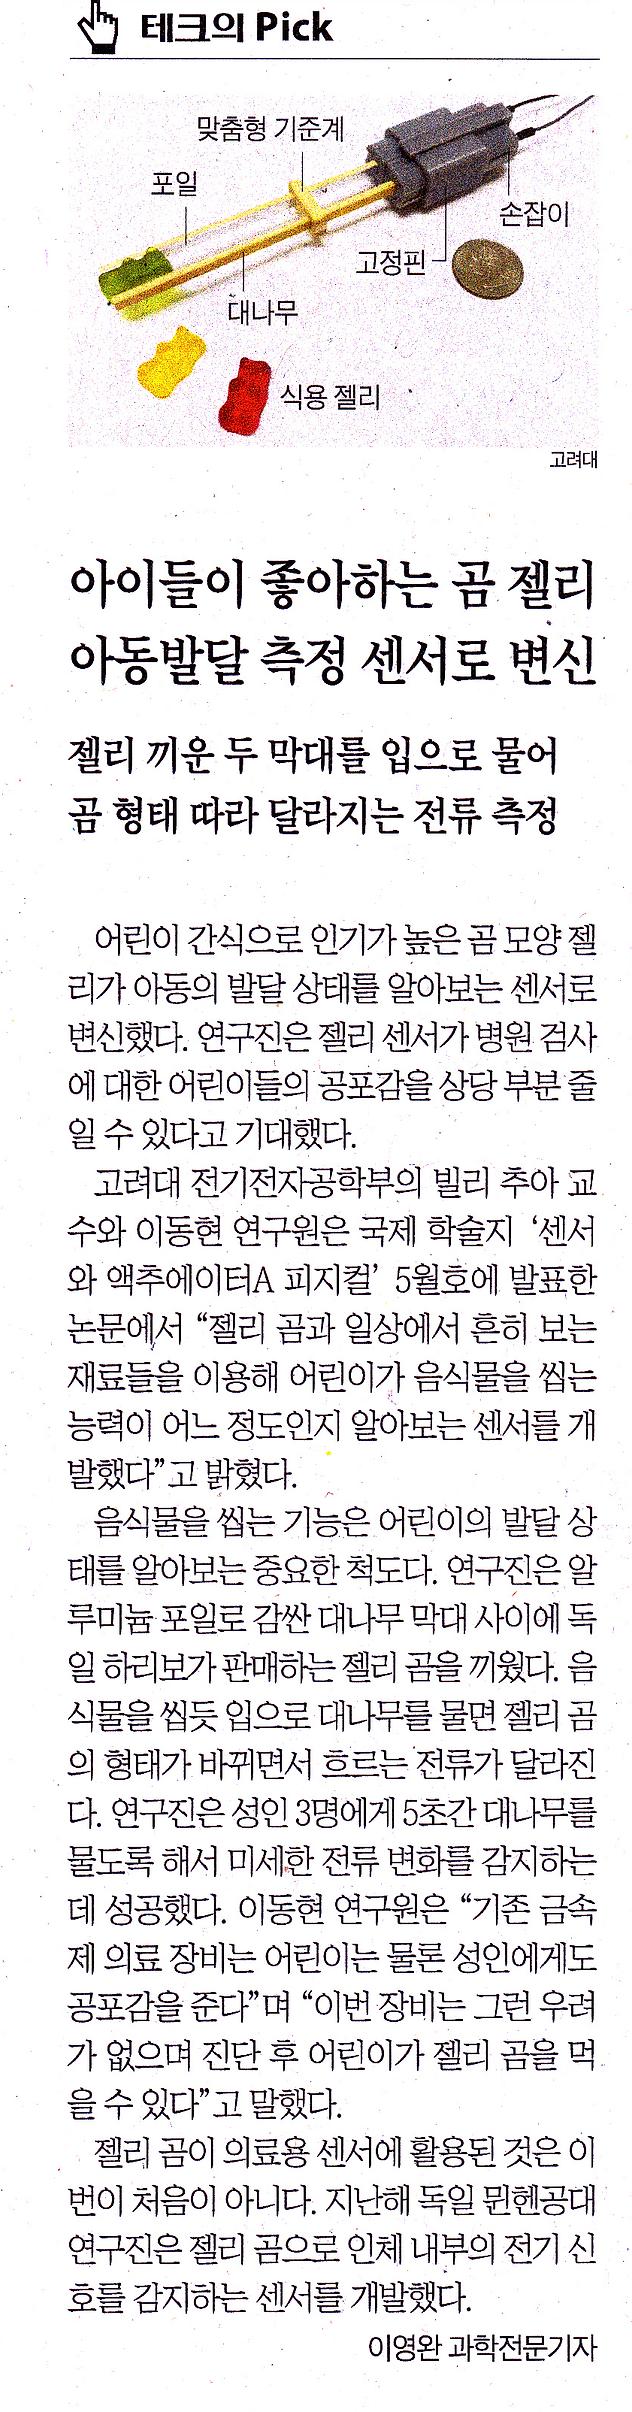 Chosun Ilbo Scan.png